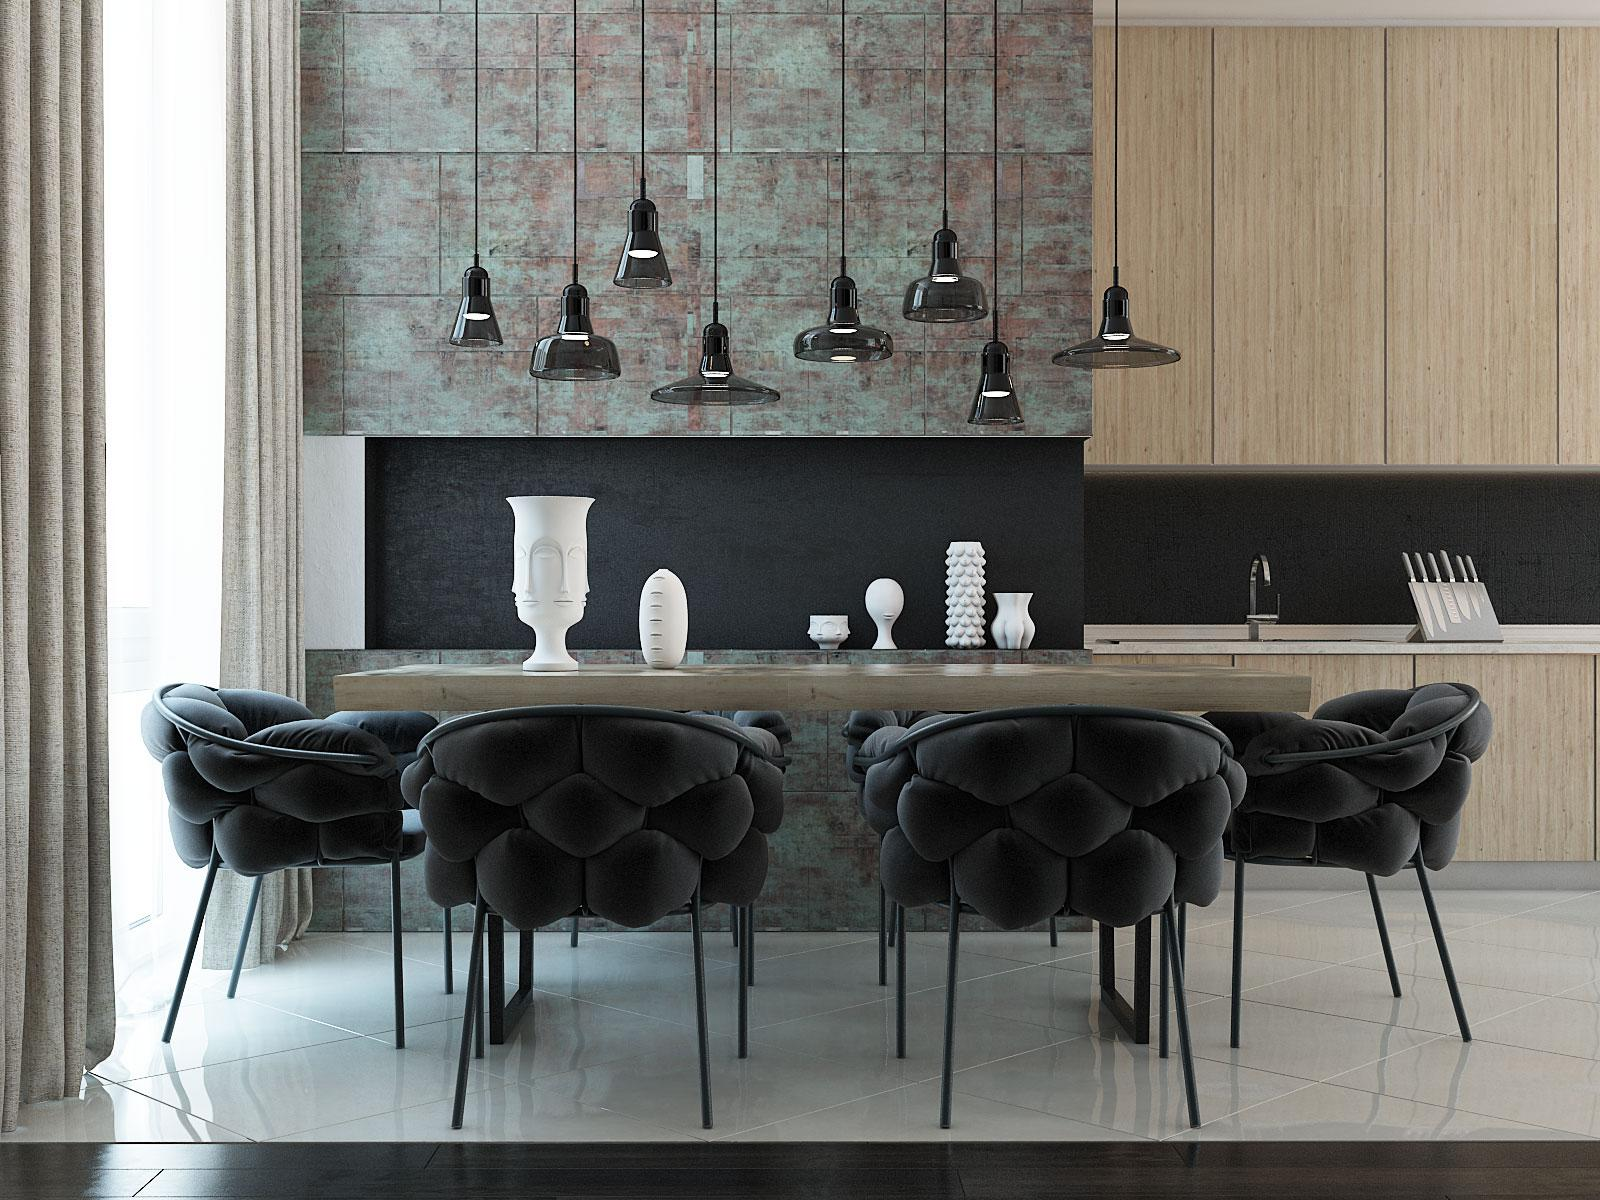 Artistic Dining Room